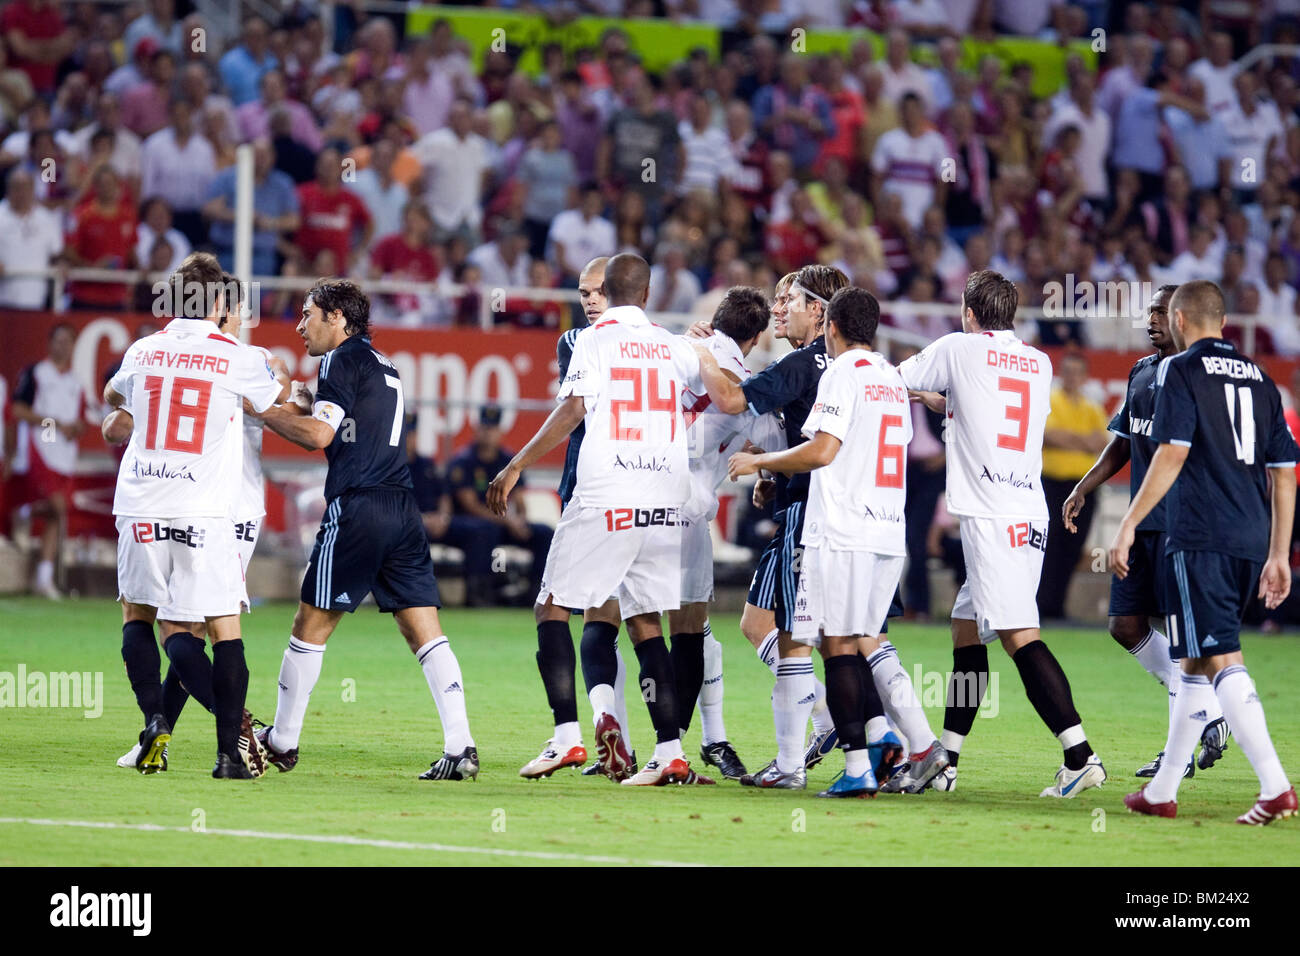 Sevilla and Real Madrid players quarreling, - Stock Image